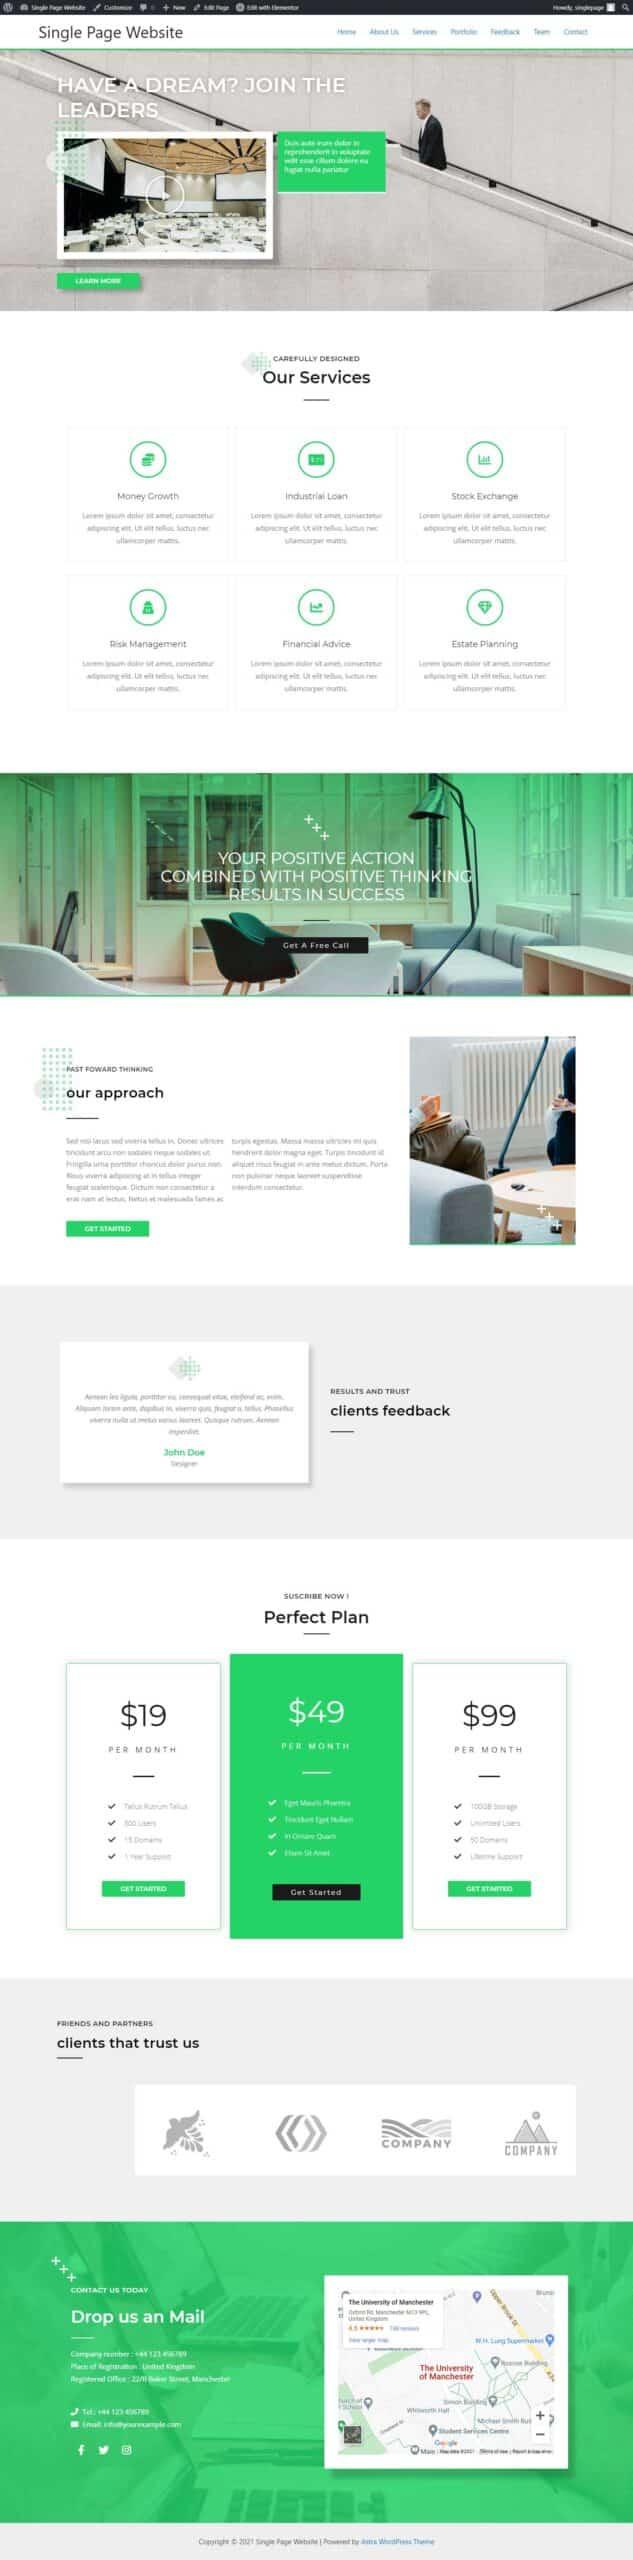 single page wordpress website, one page website WordPress, single page scrolling website, website template